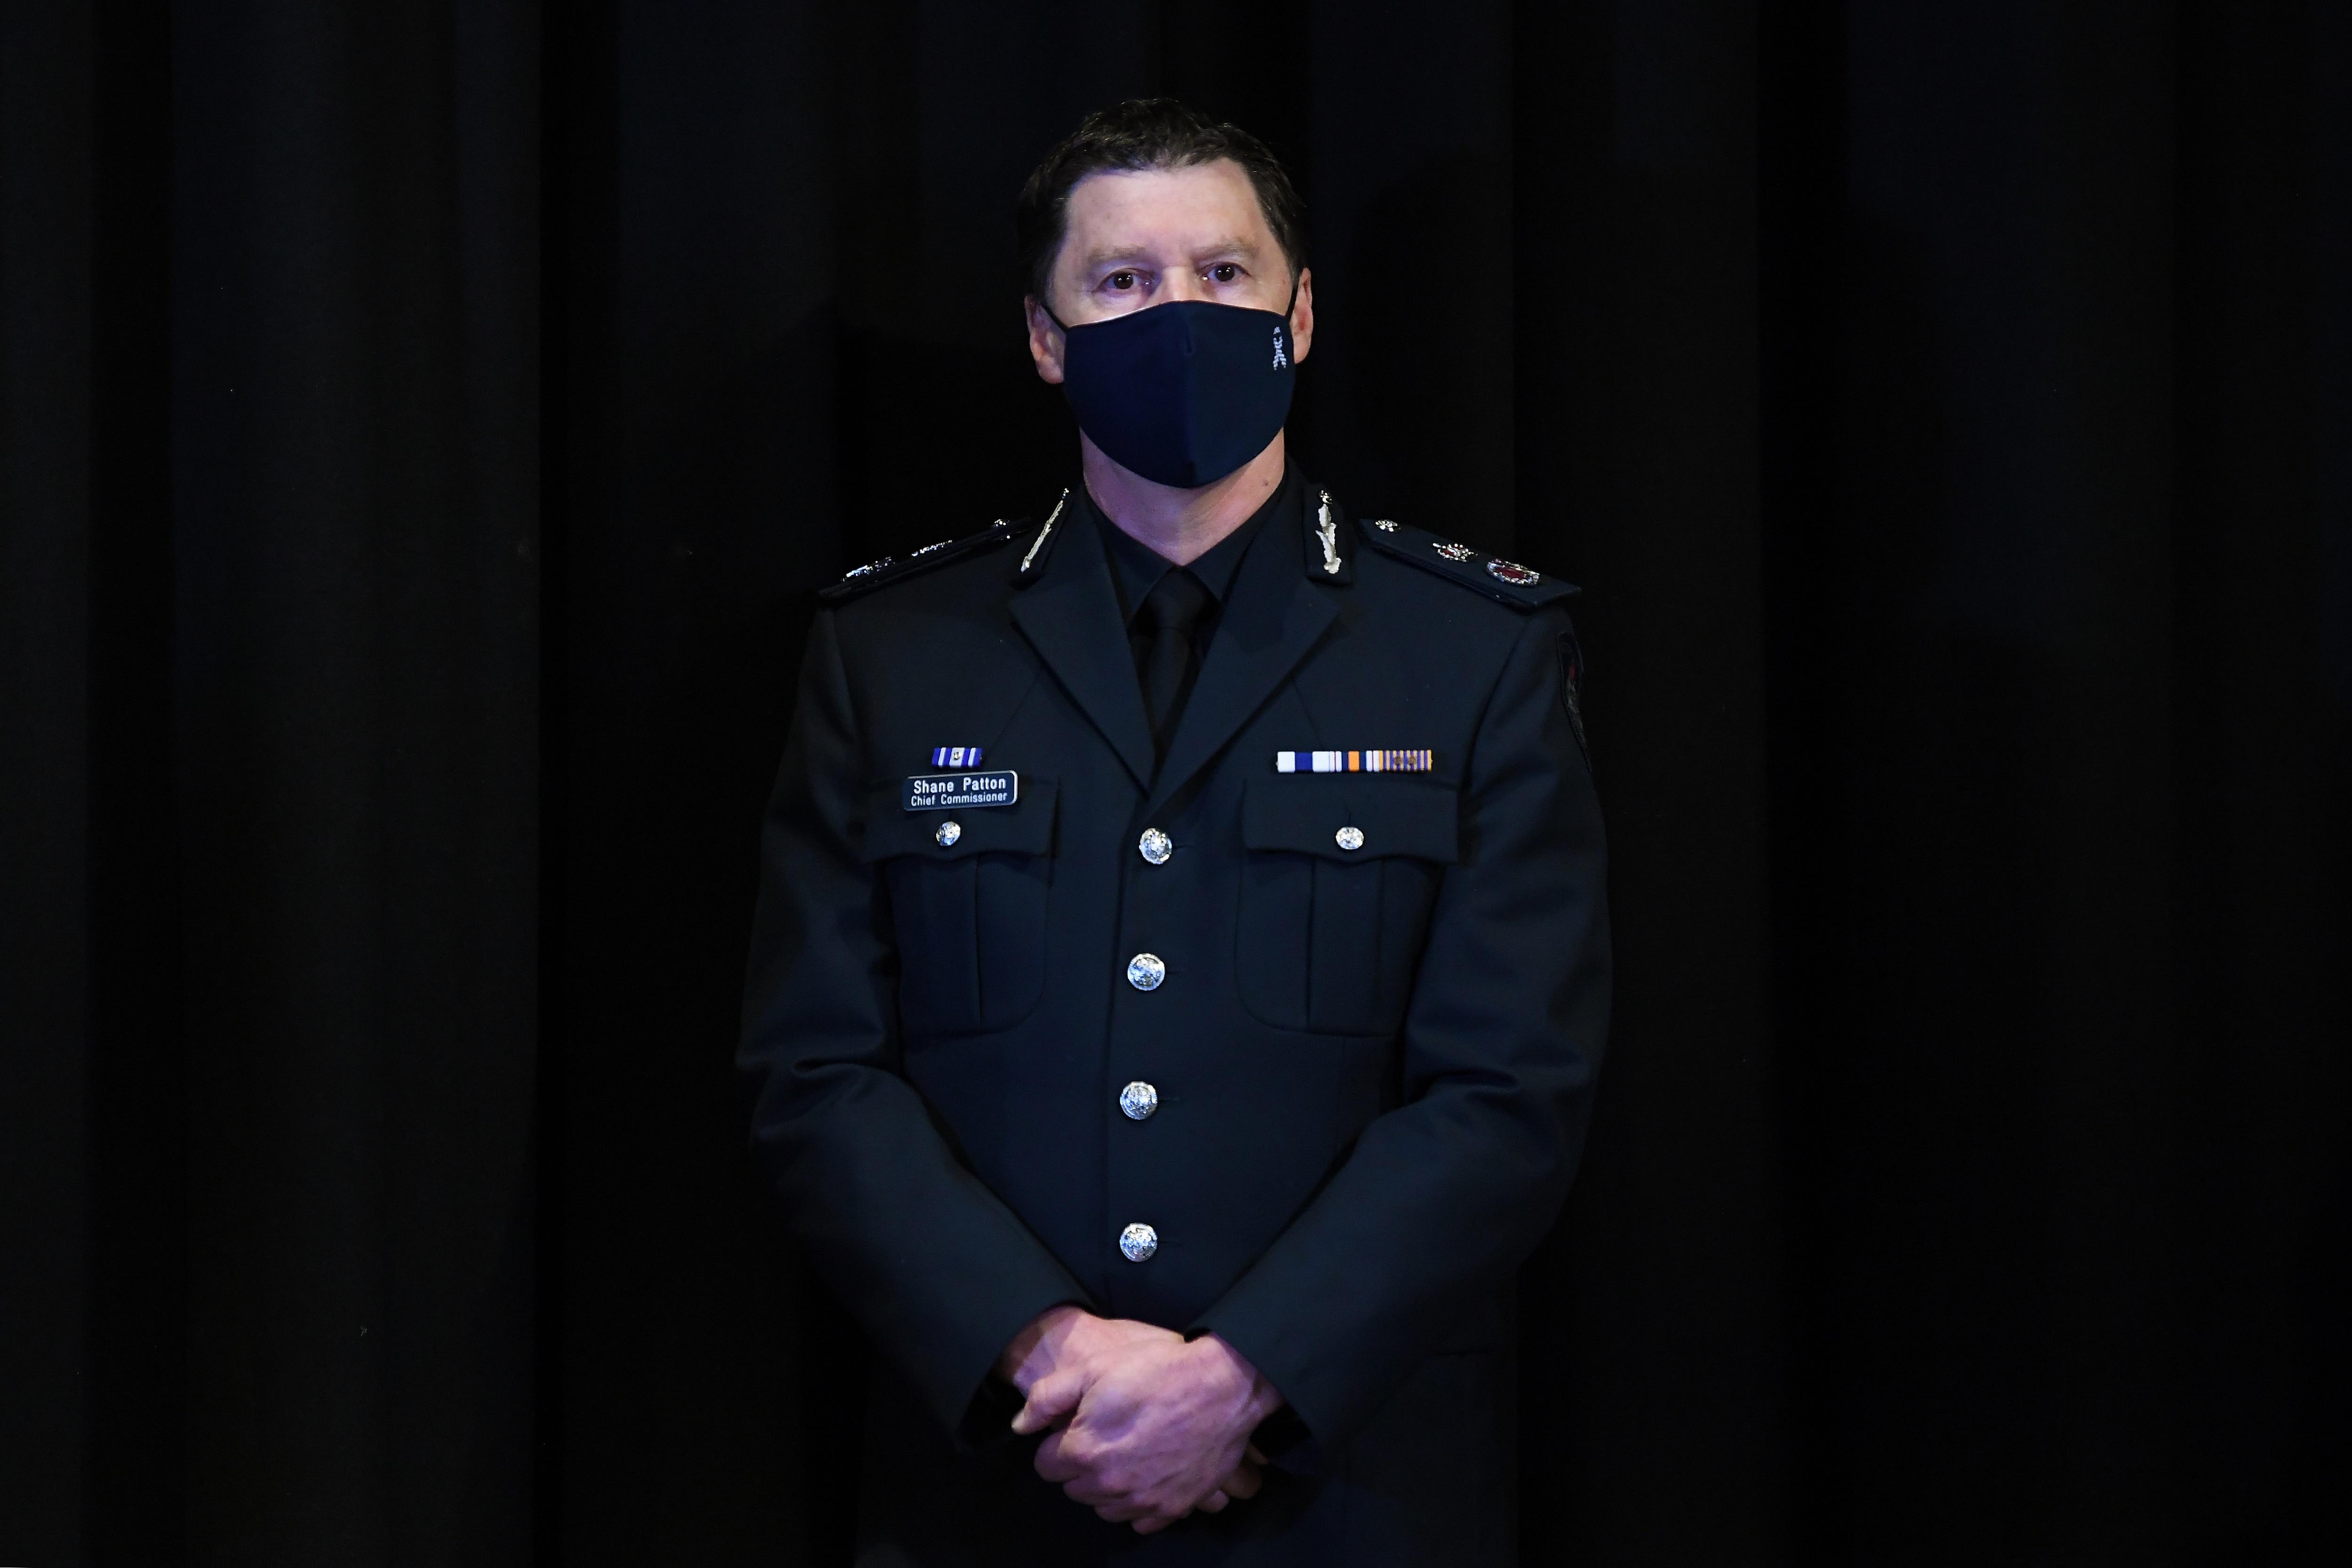 Victorian Police Chief Commissioner Shane Patton